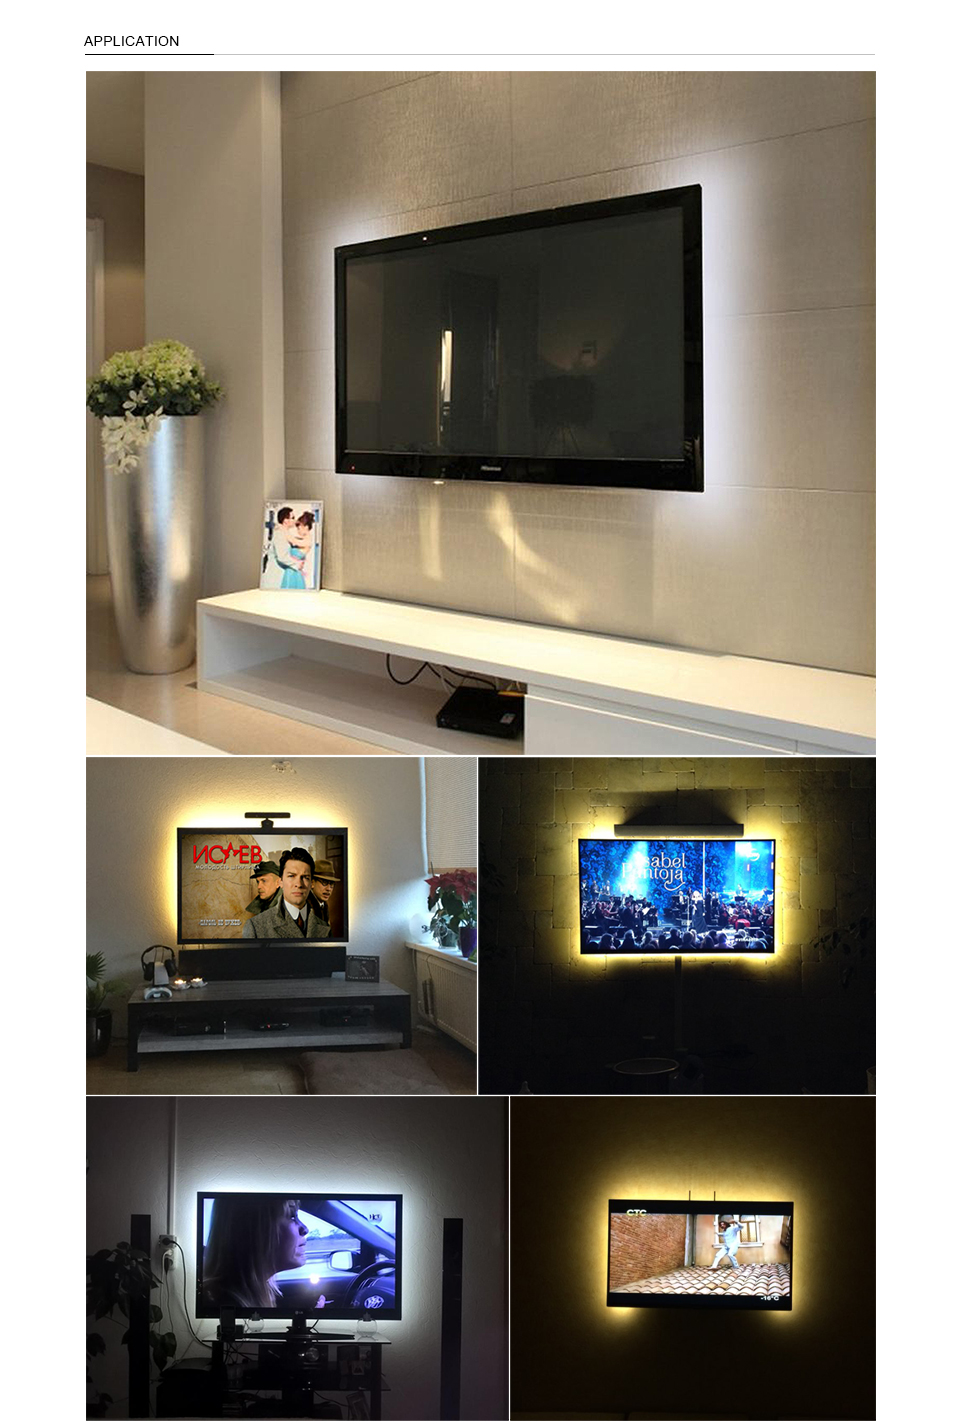 лампа USB; лампа USB; лампа USB;